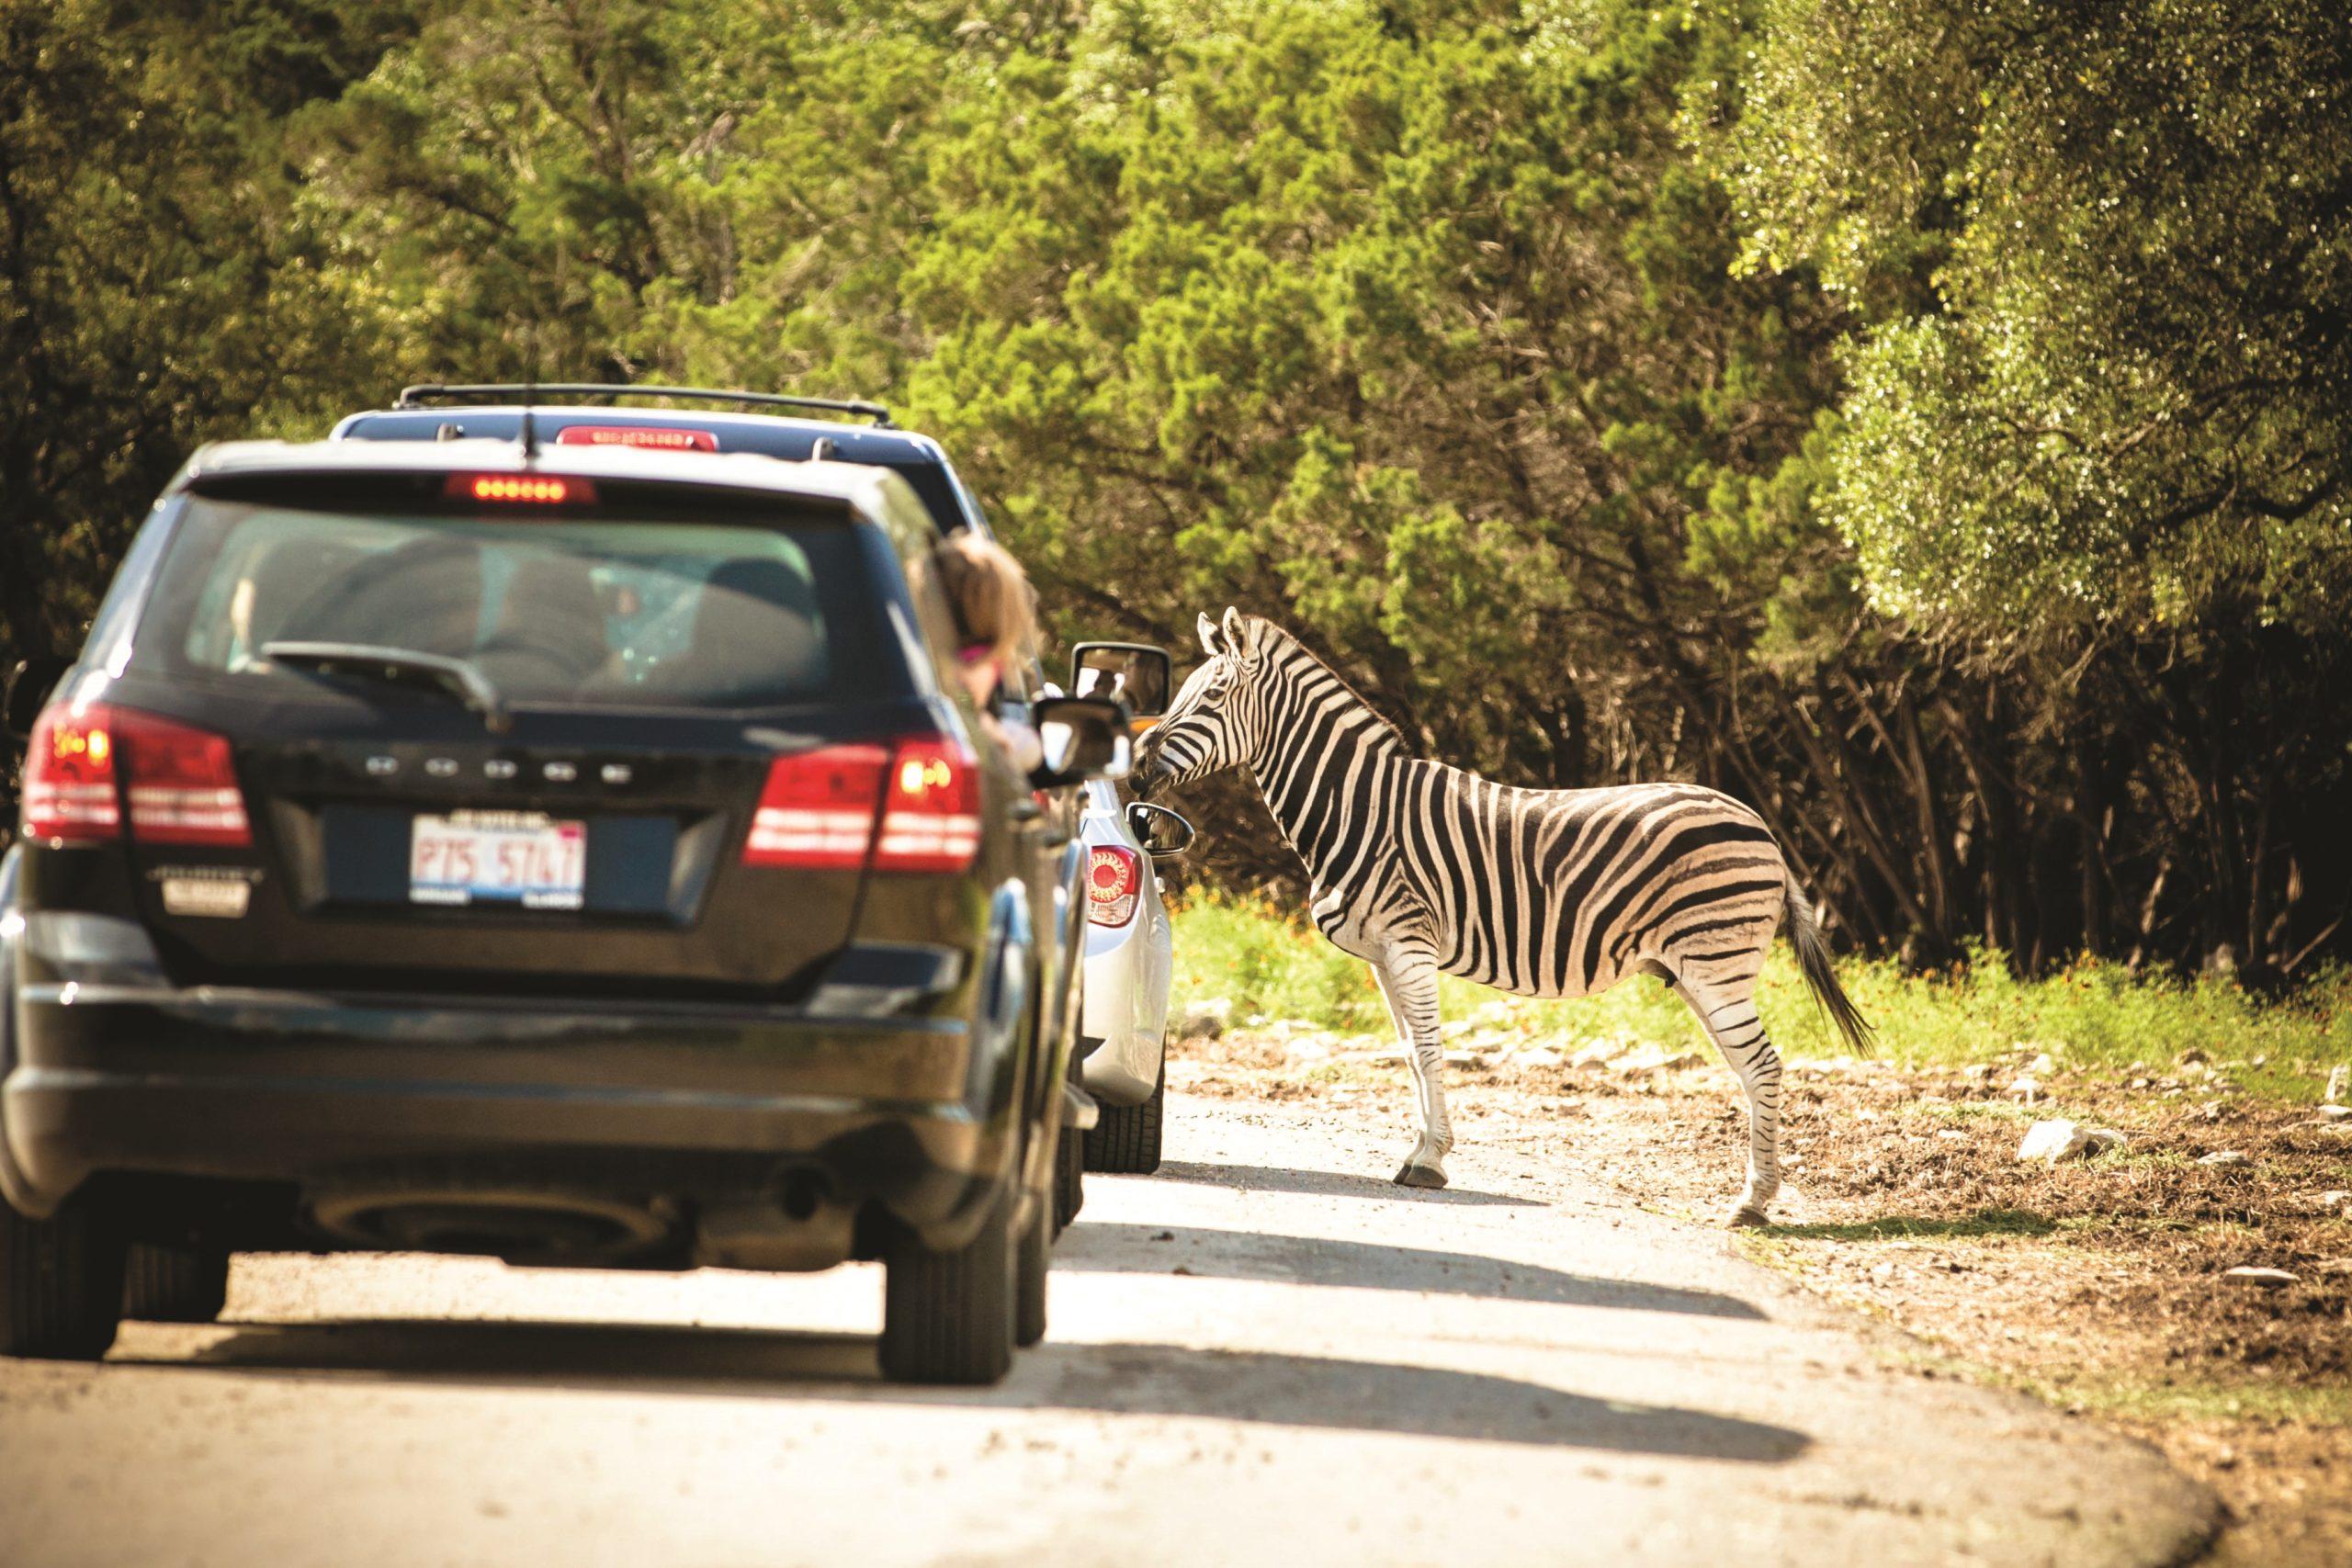 Natural Bridge Wildlife Ranch Zebra Courtesy of visitsanantonio.com